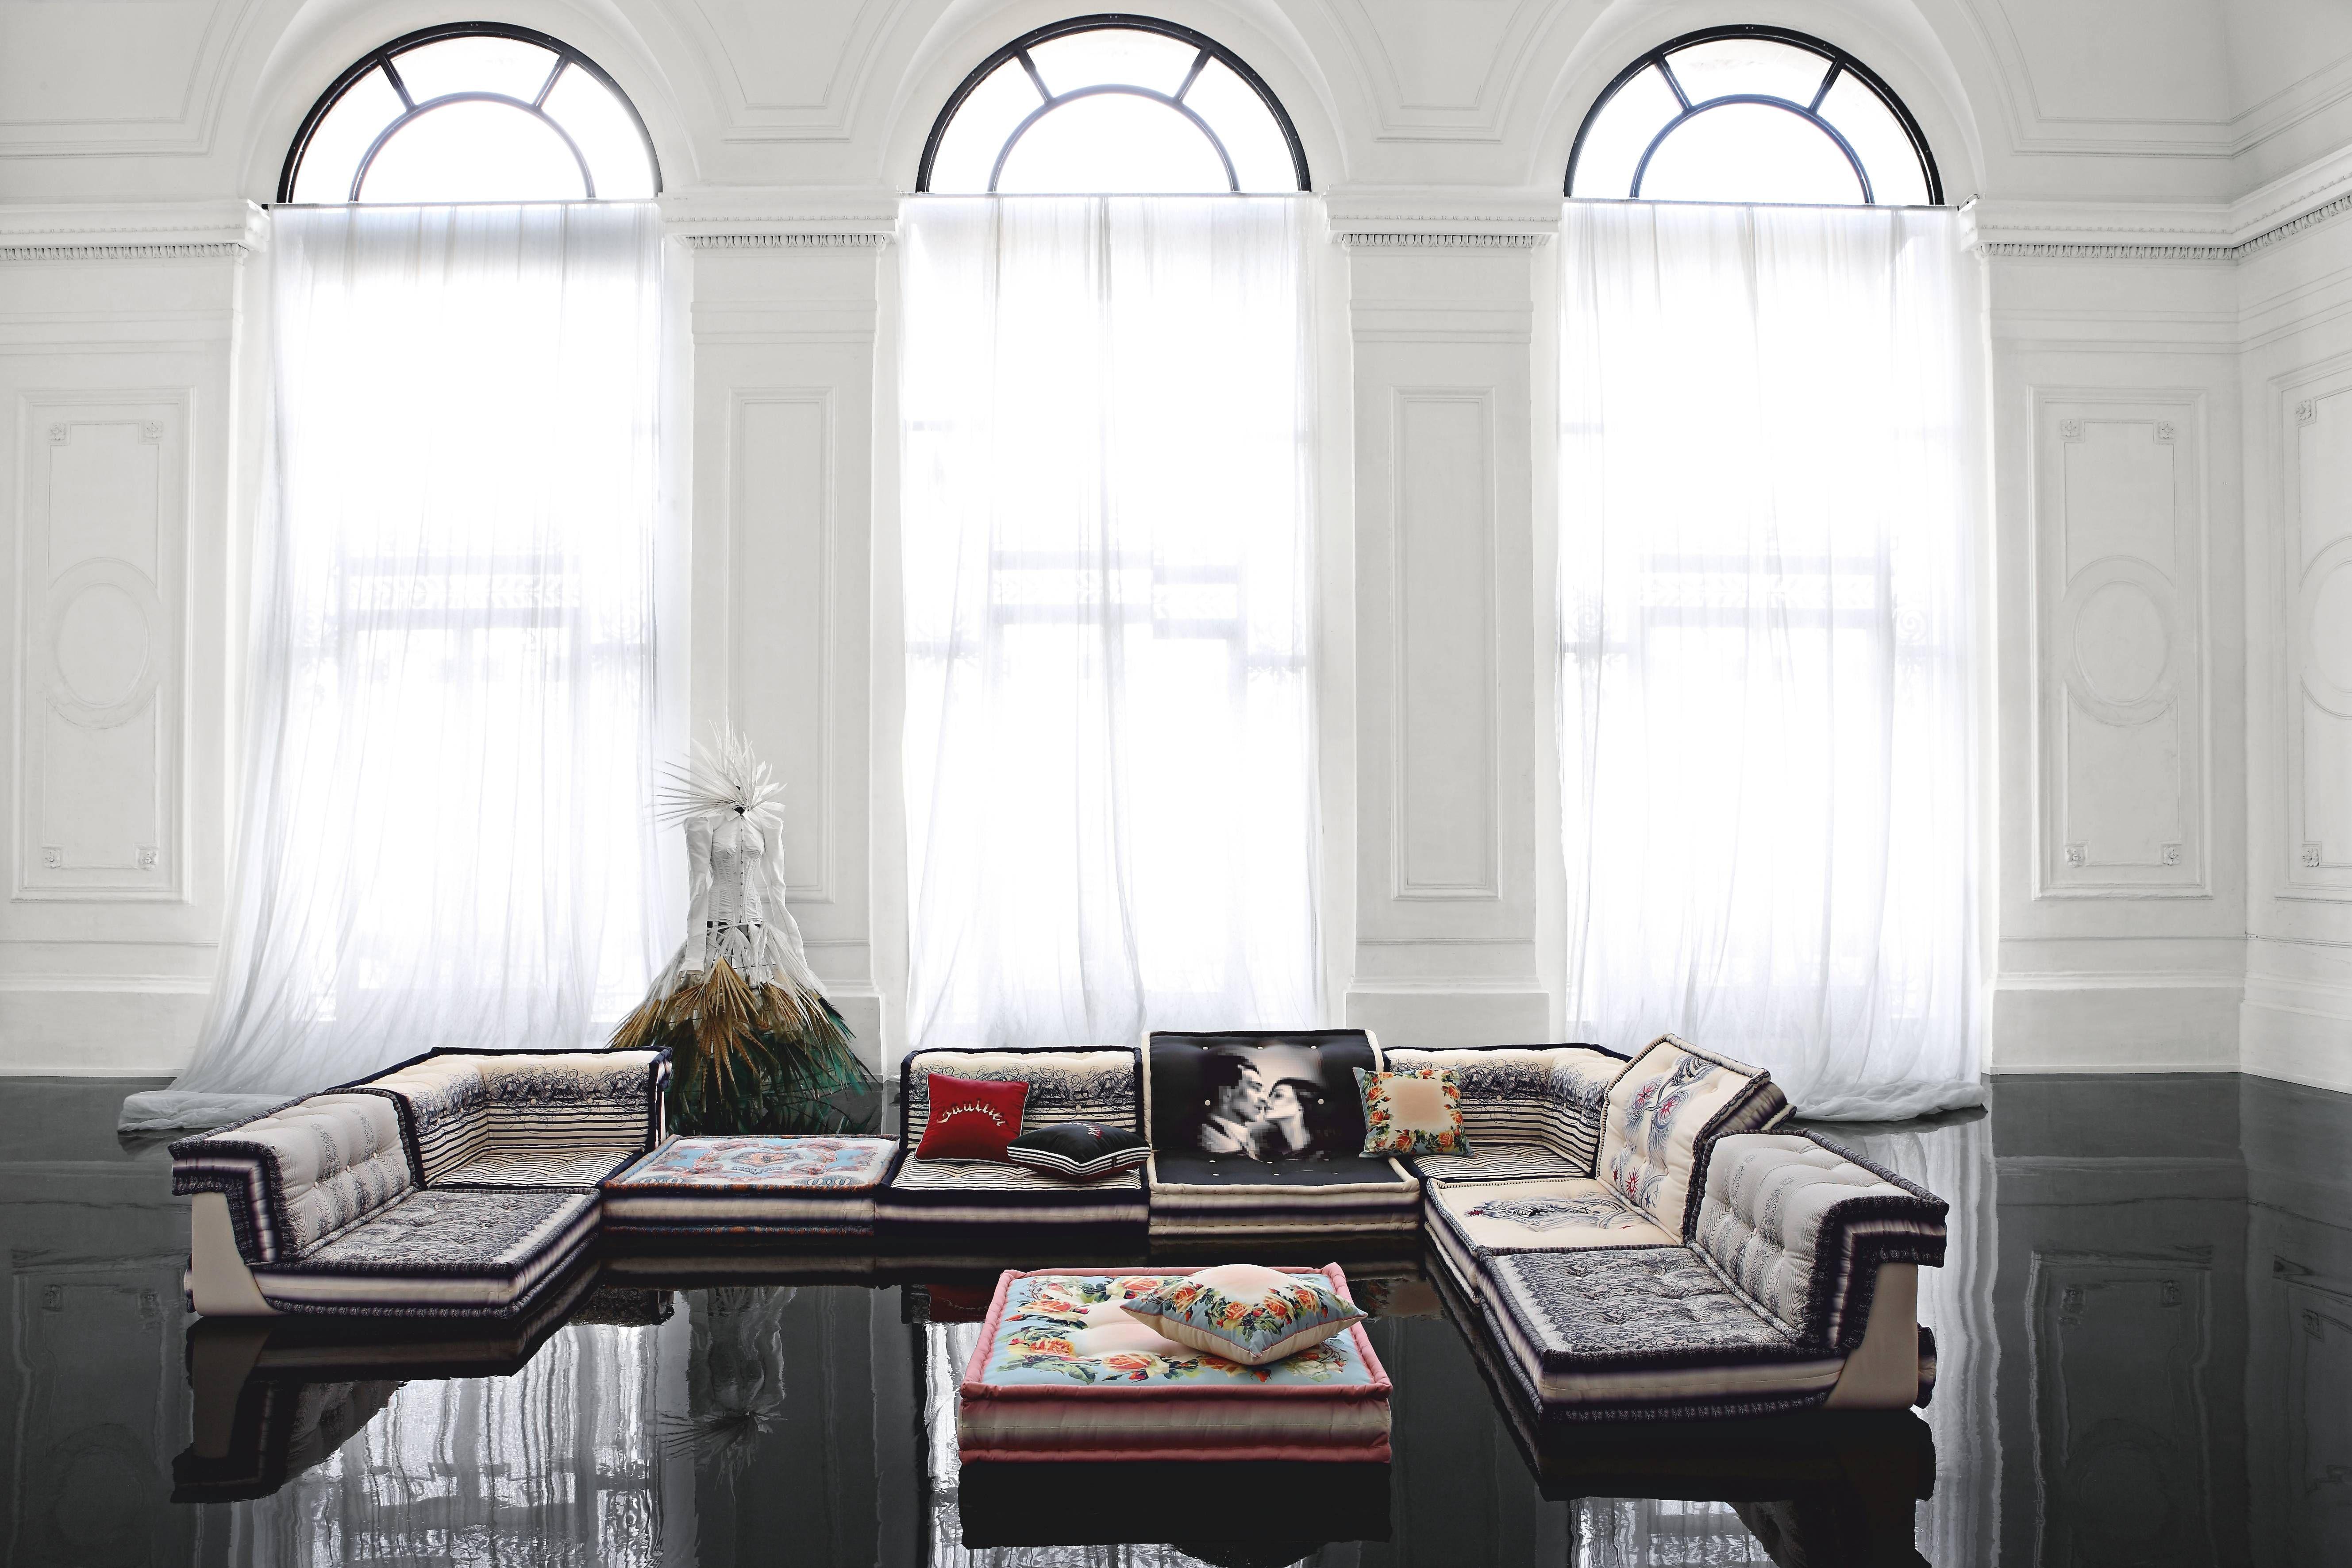 Roche Bobois MAH JONG COUTURE modular sofa dressed by Jean Paul